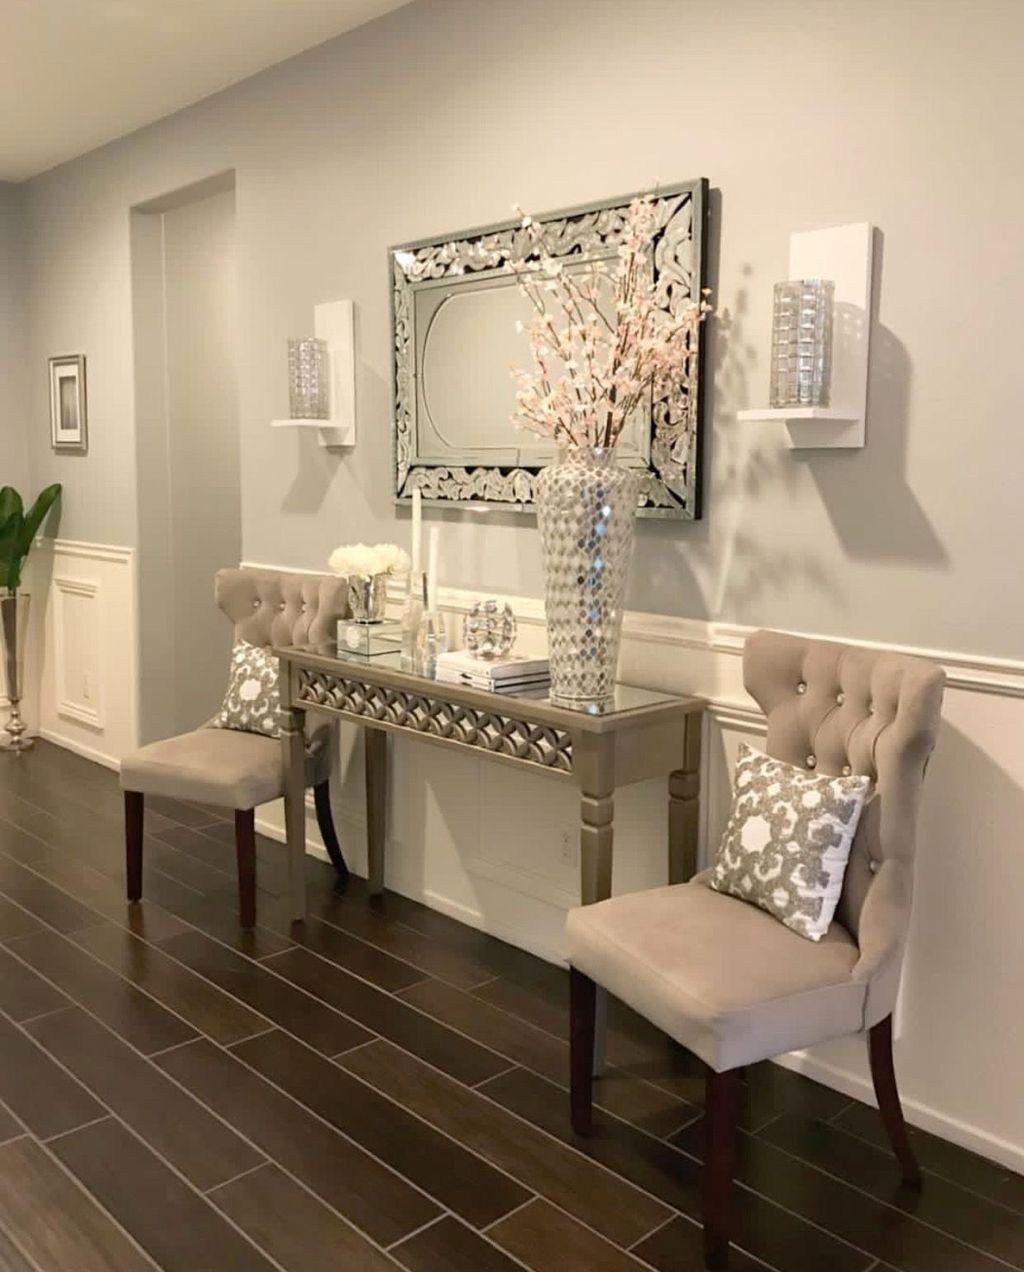 Bedroom Wall Decor Ideas Home Decor Wall Art Master: 20+ Fabulous Hallway Decor Ideas For Home